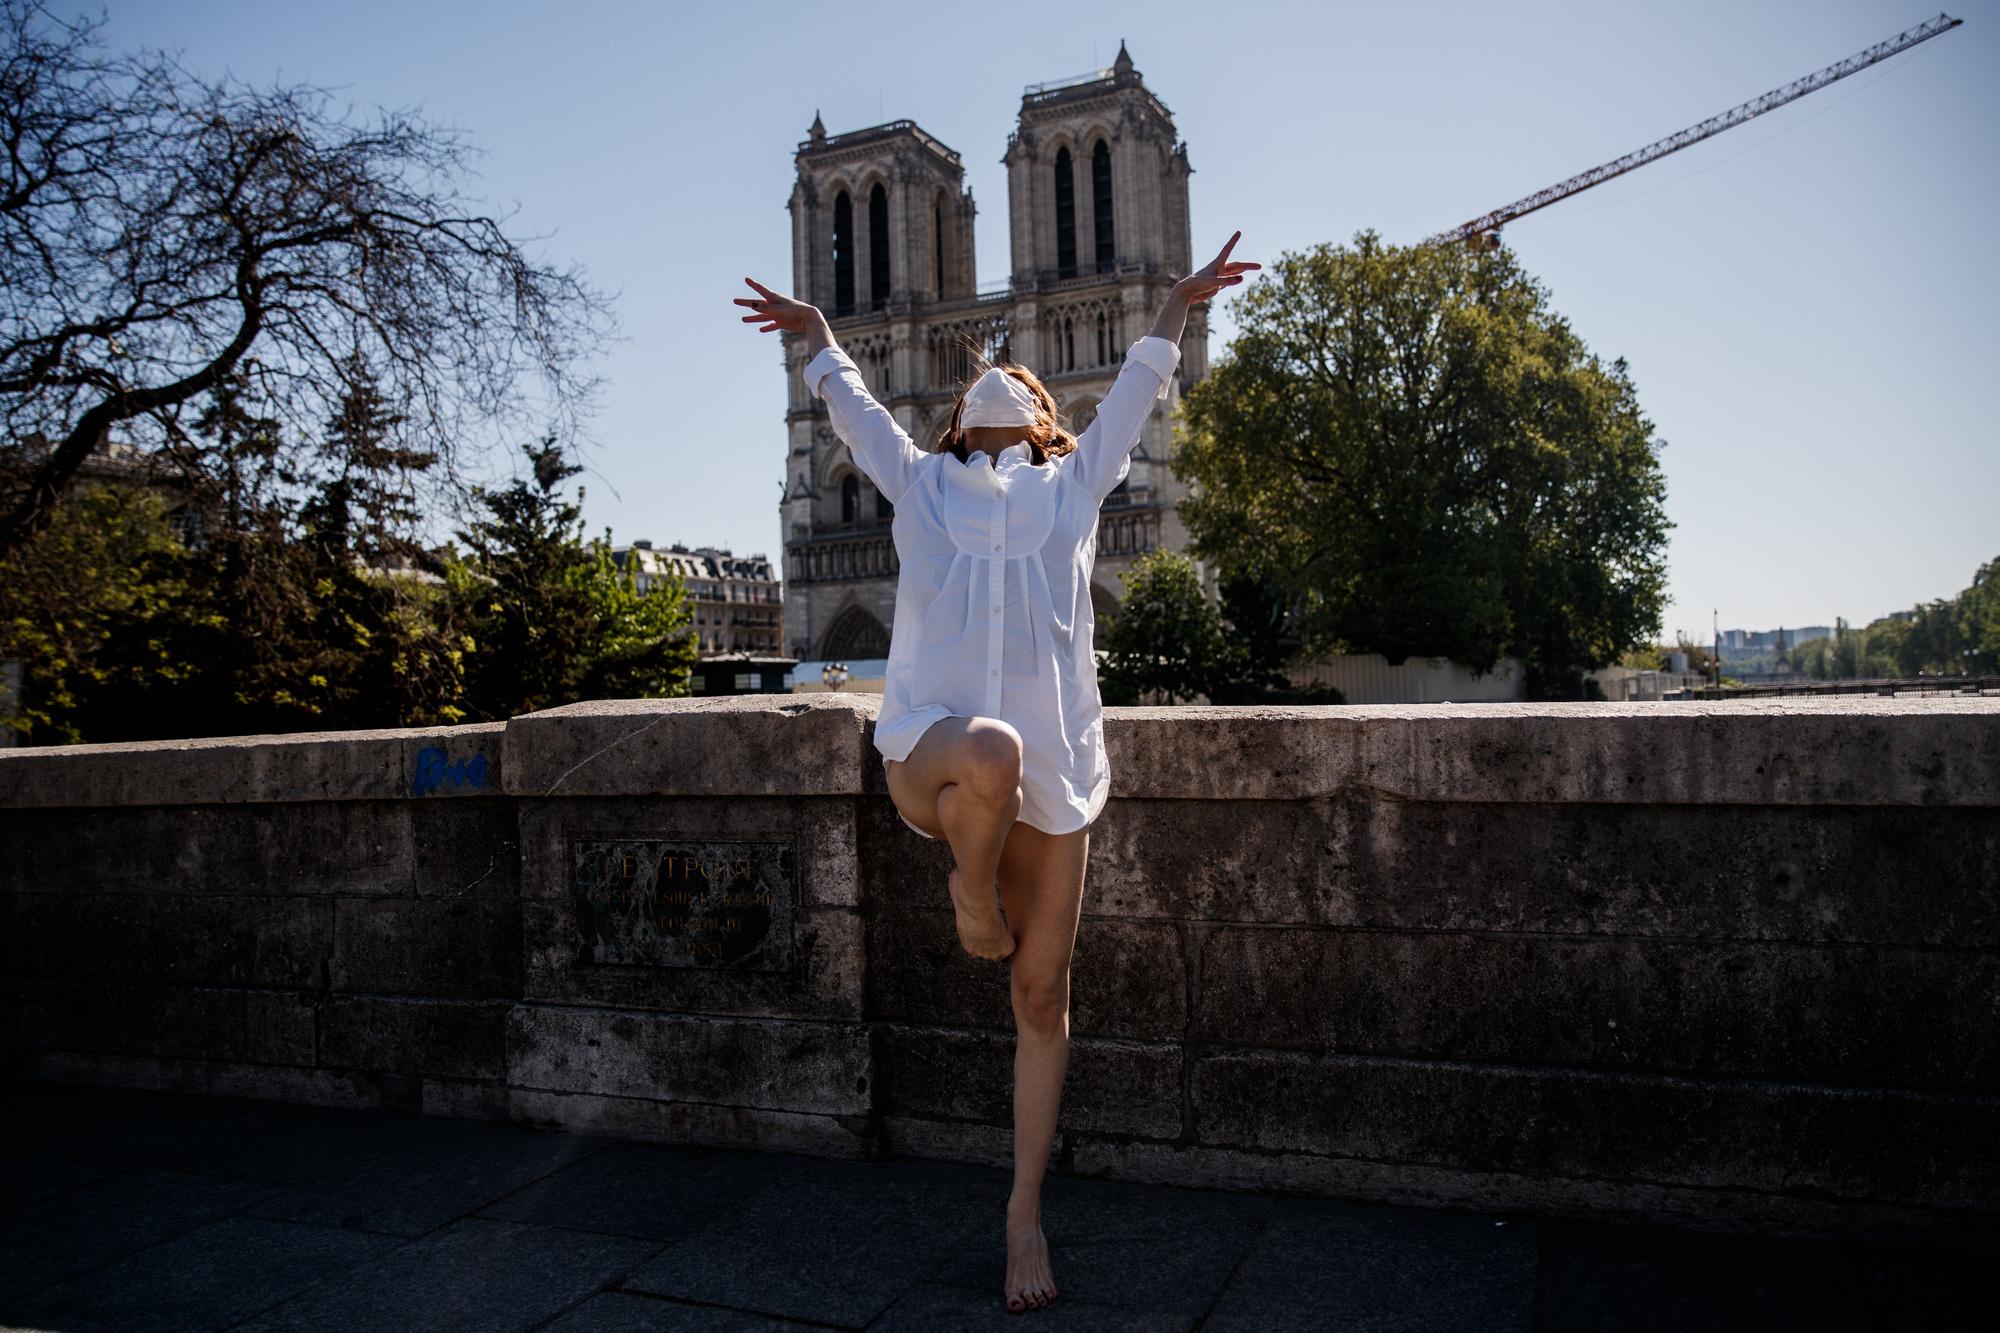 Yara al-Hasbani devant Notre-Dame de Paris, belga